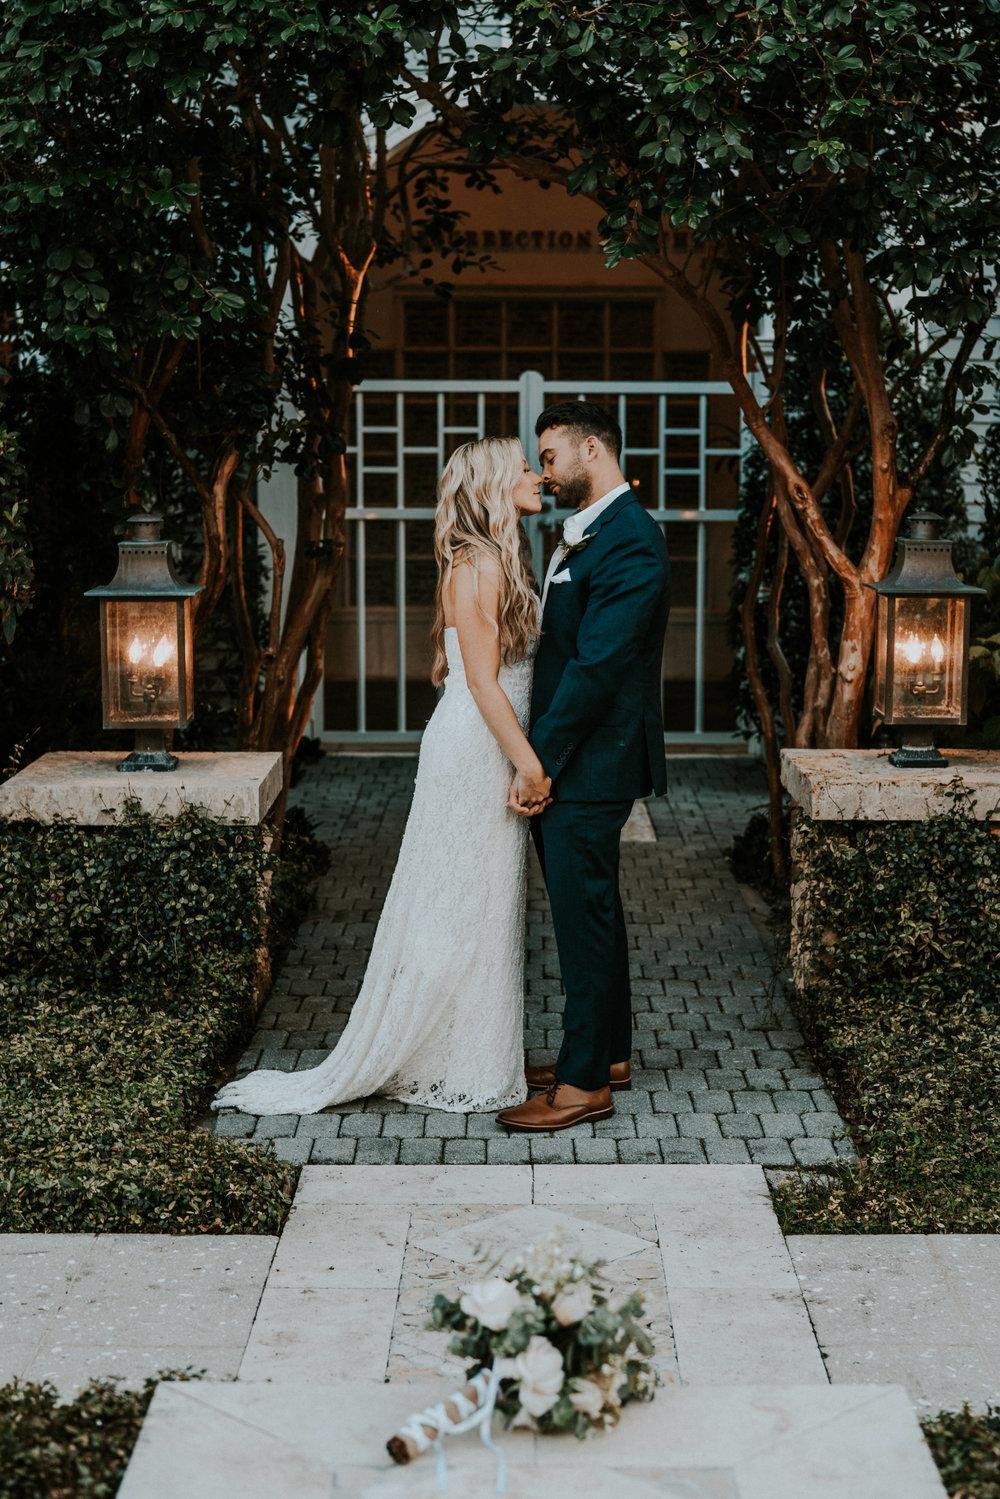 MORE WEDDINGS -